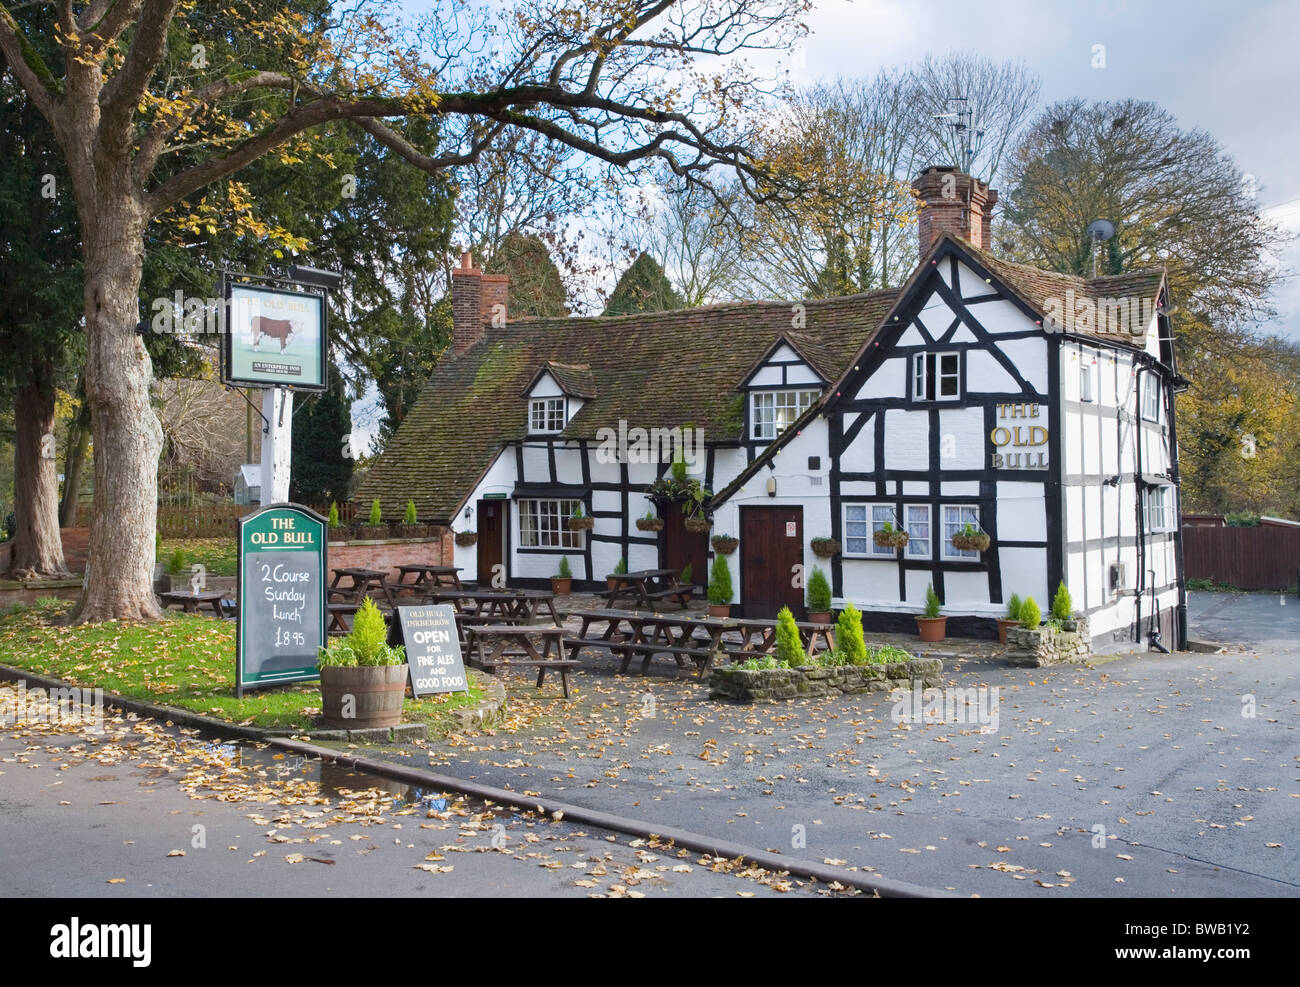 Le Old Bull Inn à Inkberrow. Worcestershire. L'Angleterre. UK. Photo Stock